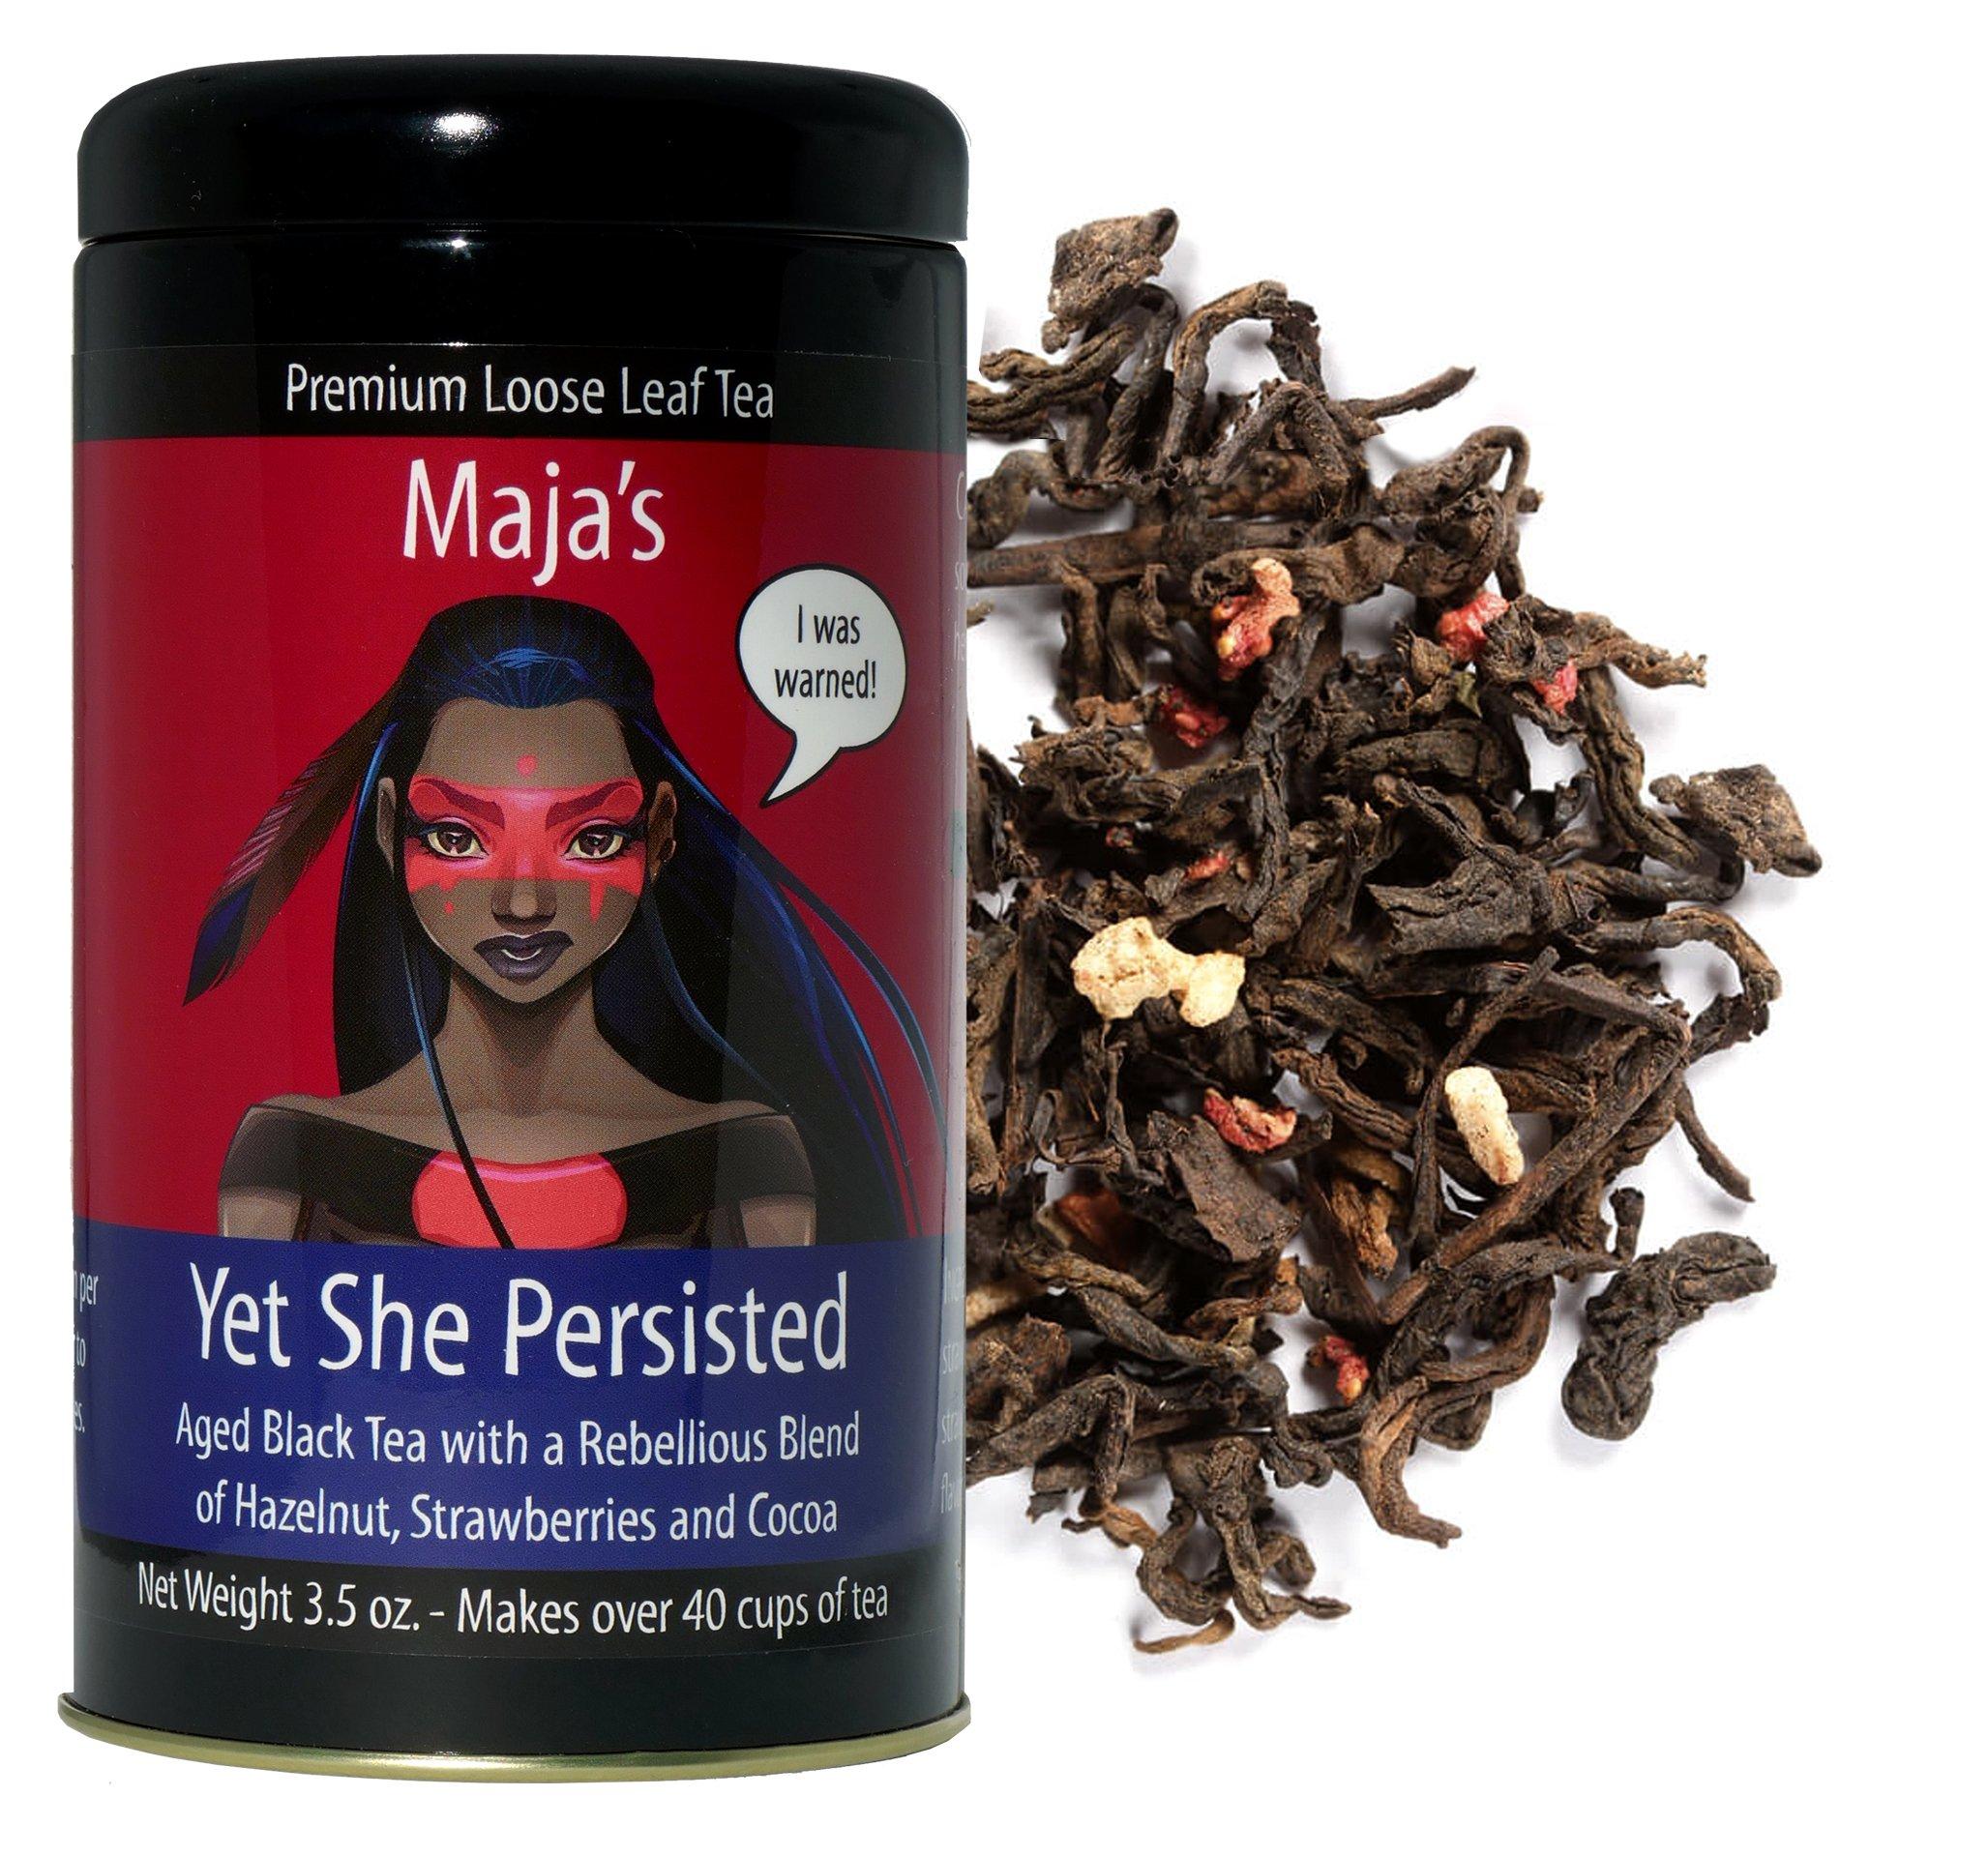 HEIDI: A cup of tea turns into sexual ravishment